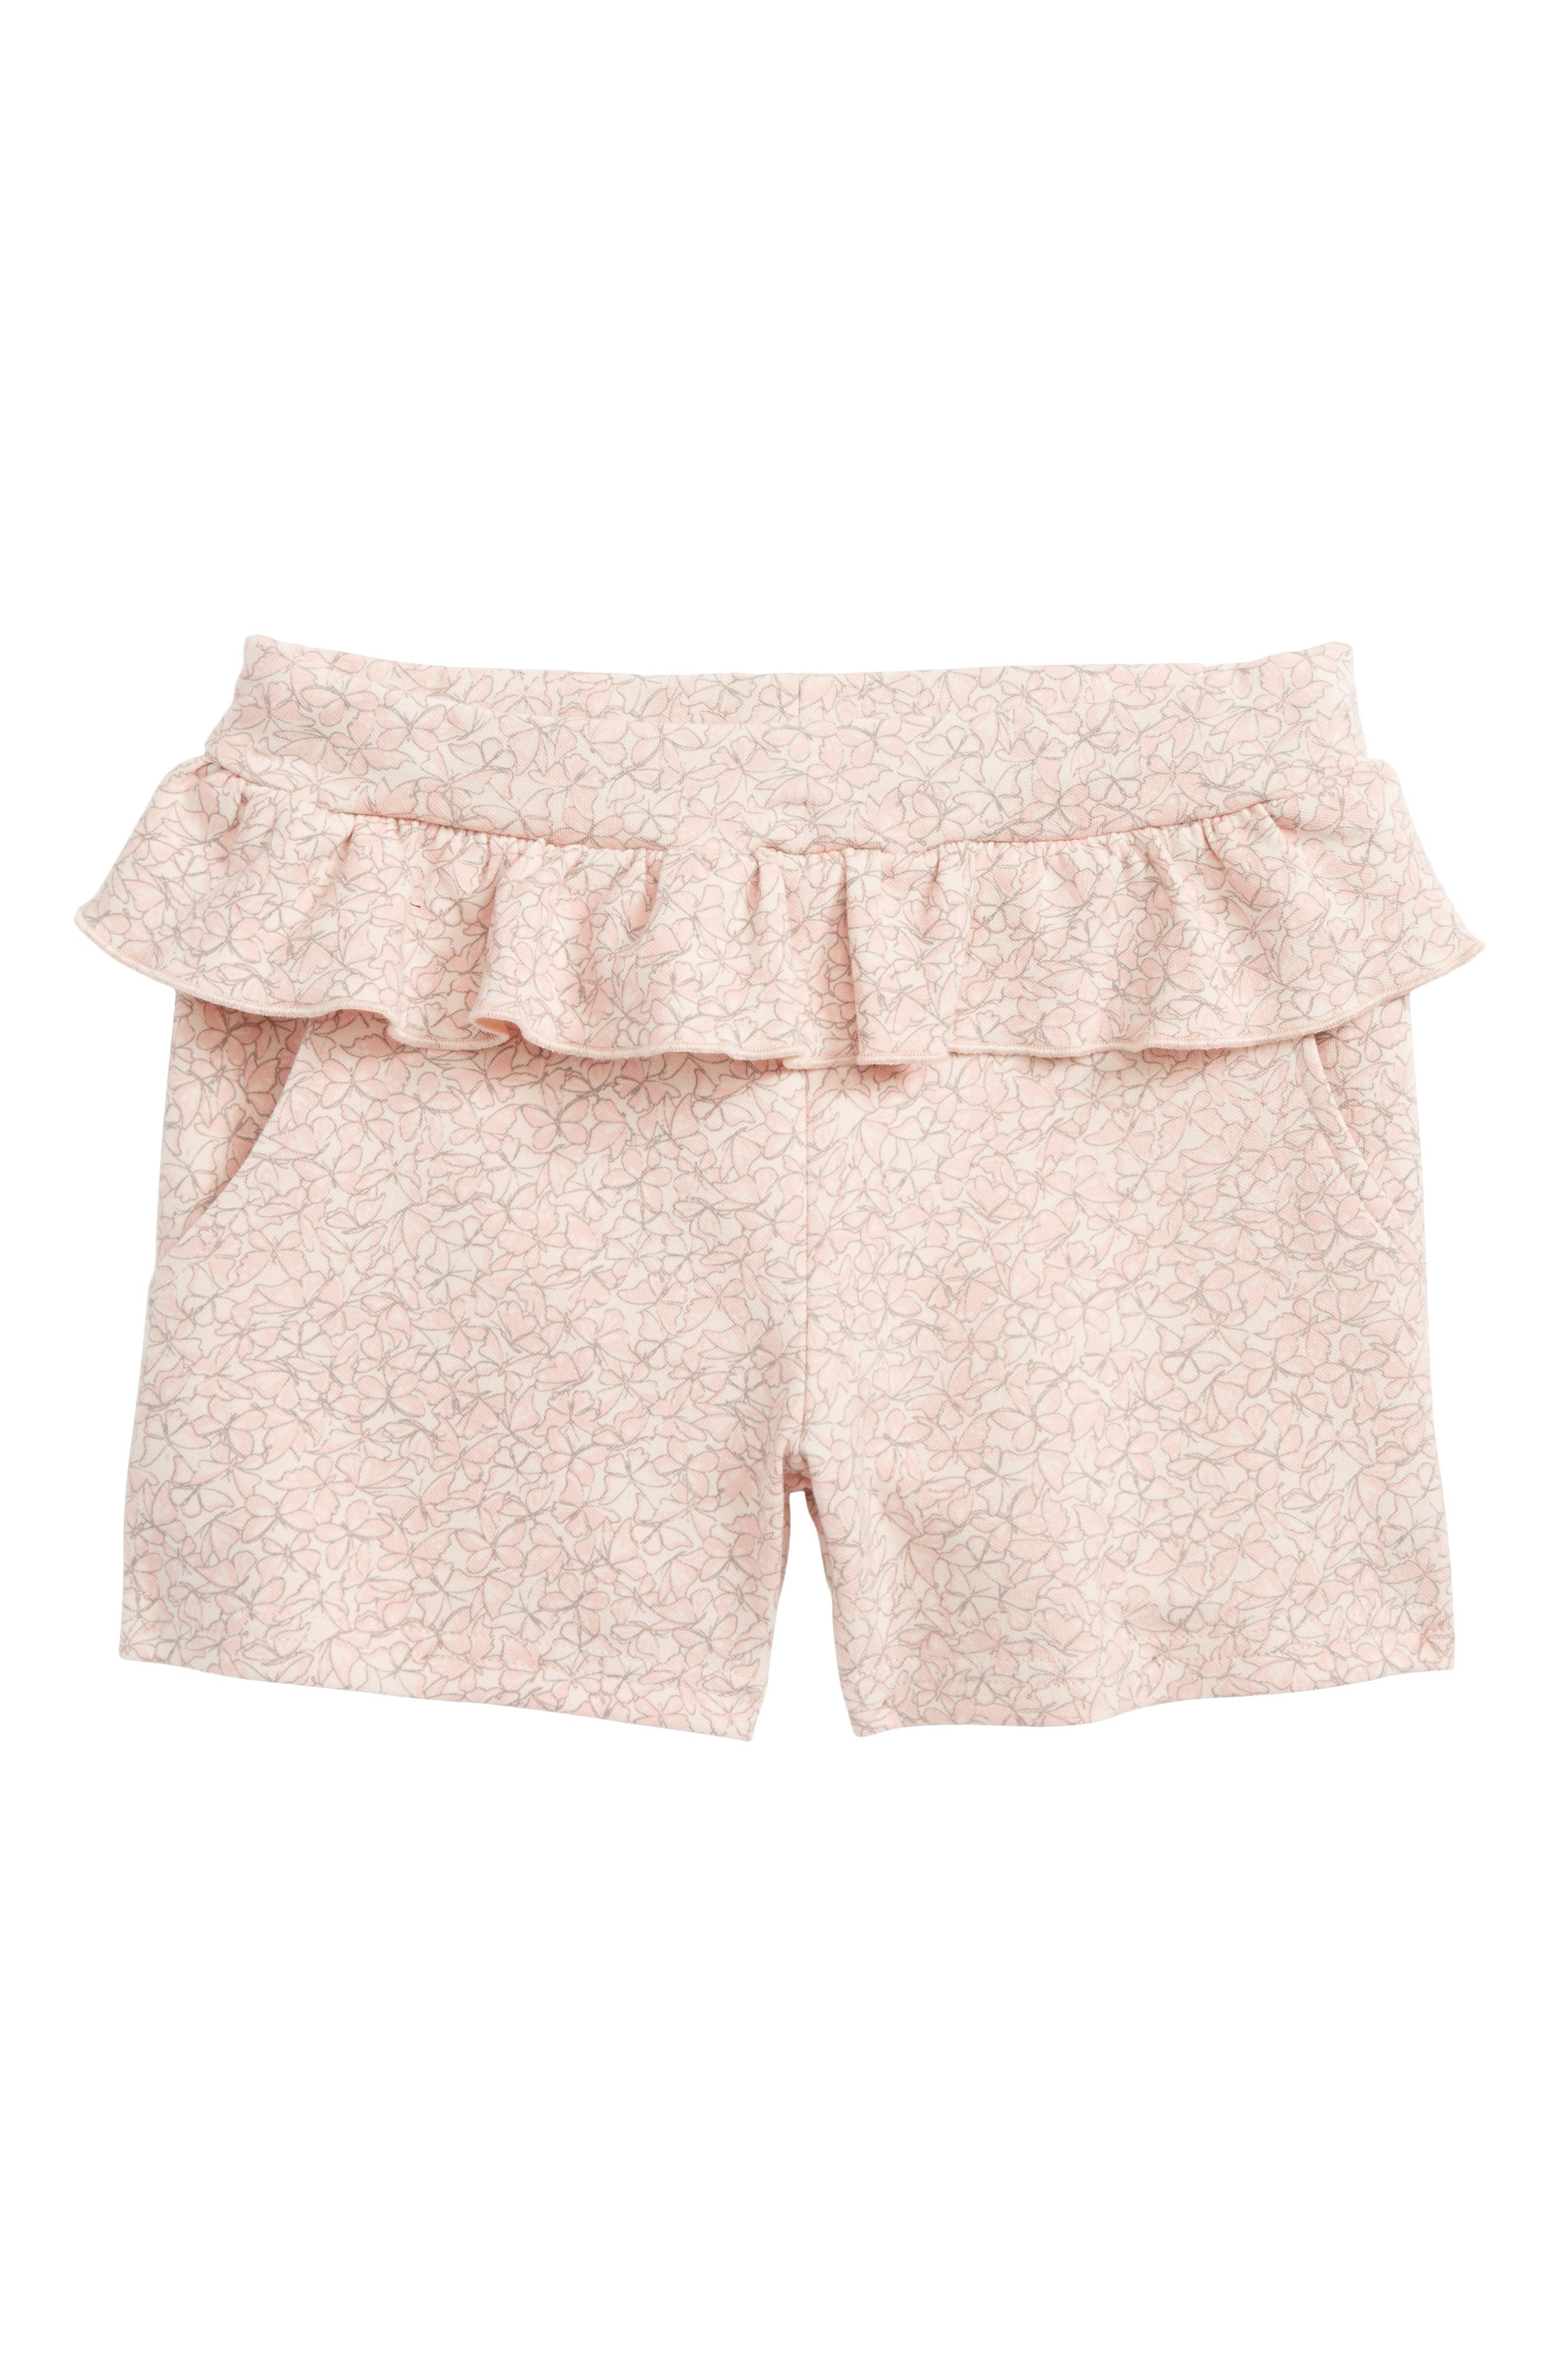 Main Image - Wheat Butterfly Ruffle Shorts (Toddler Girls, Little Girls & Big Girls)